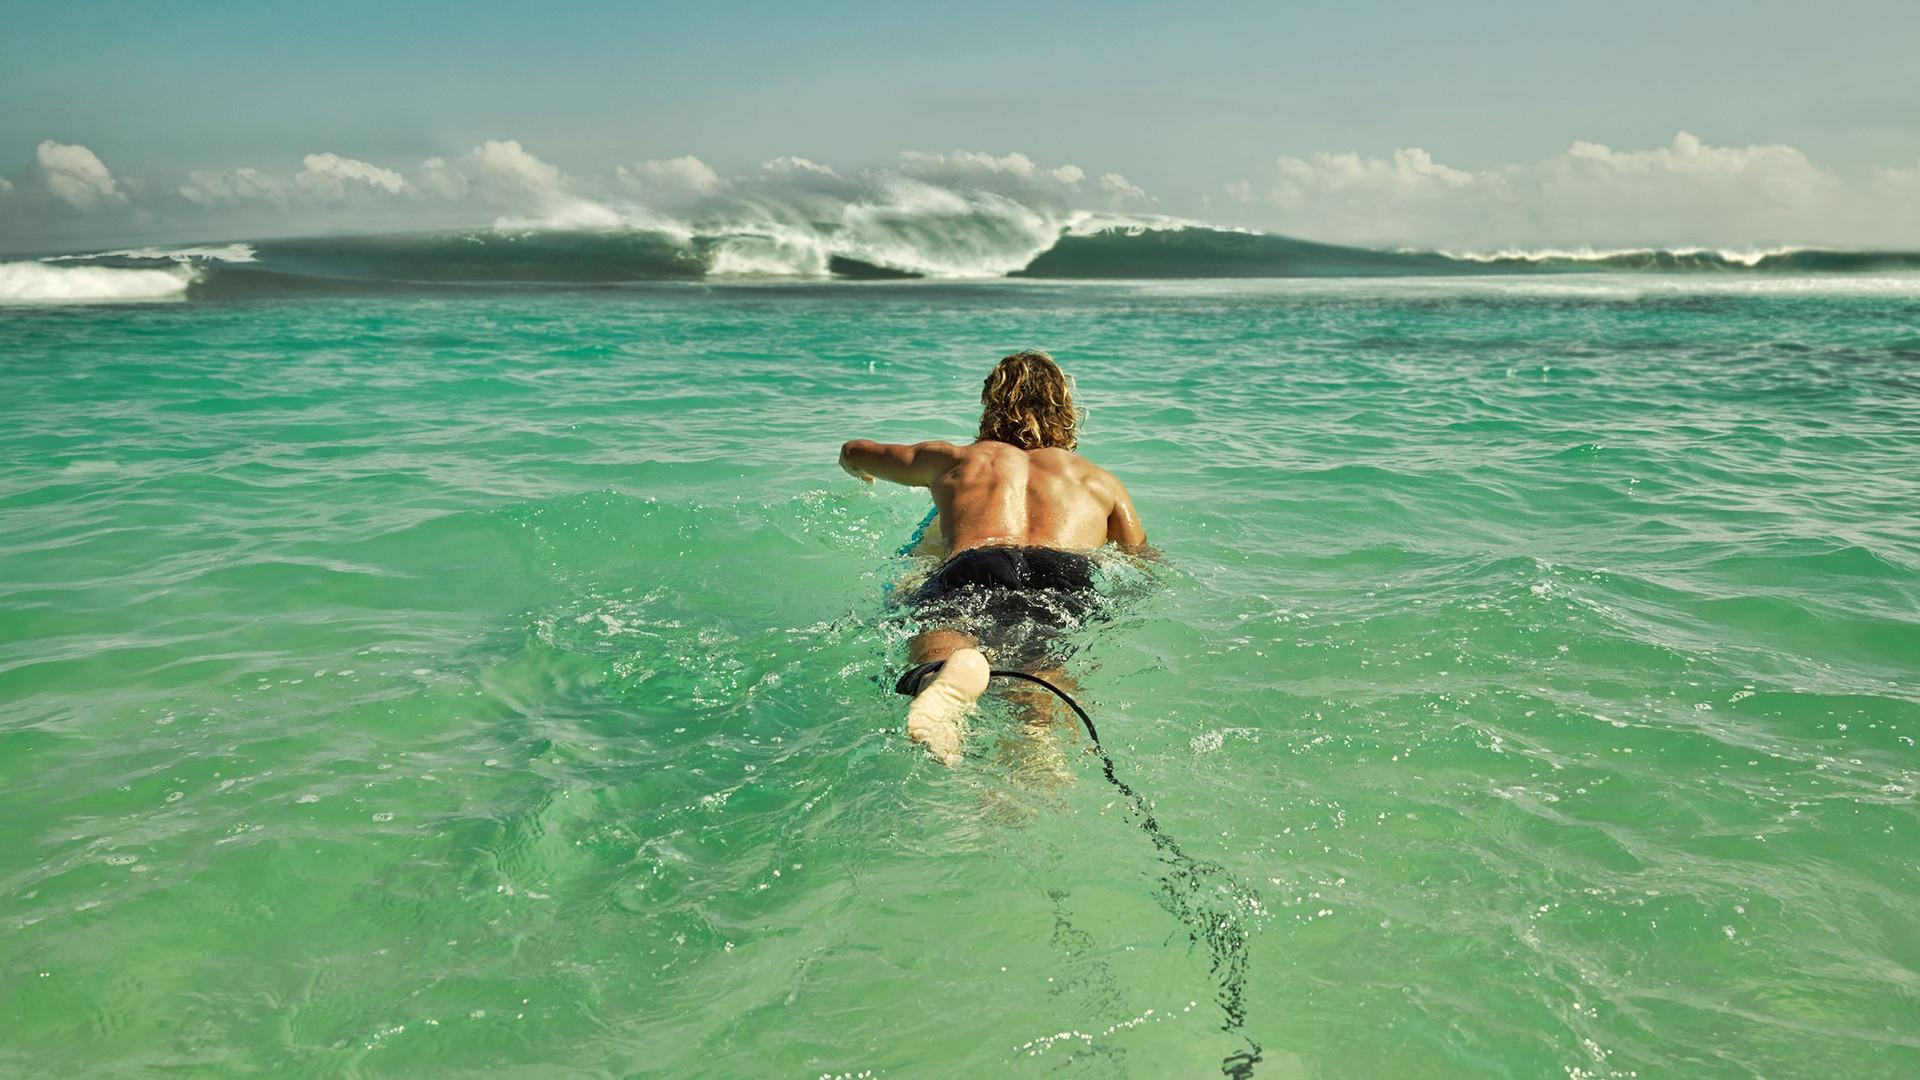 Surfer Paddling Out.jpg